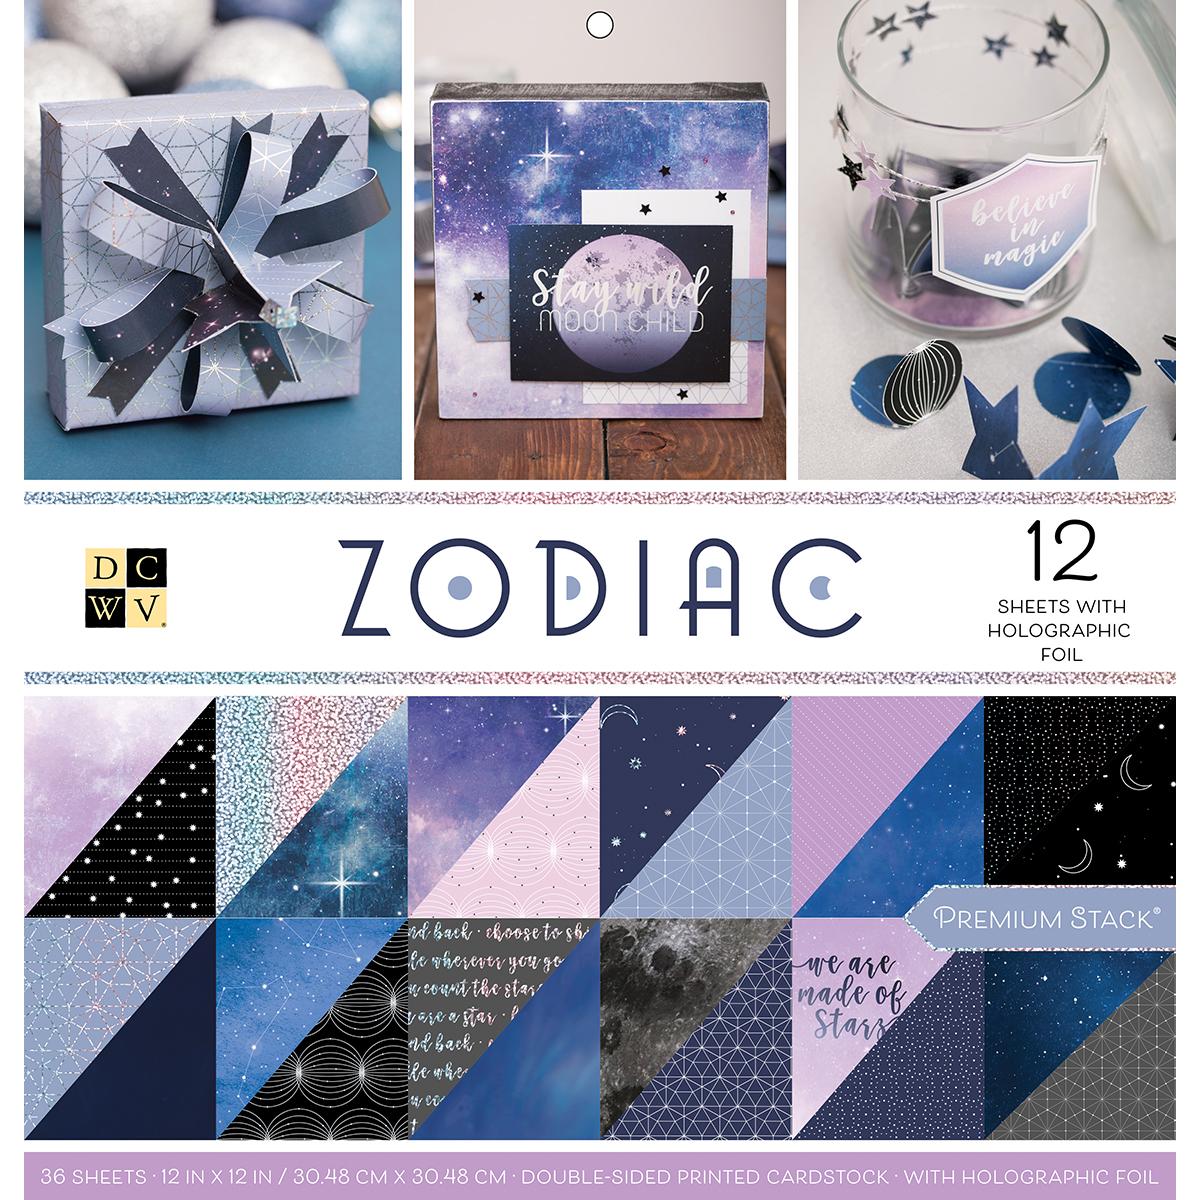 DCWV Double-Sided Cardstock Stack 12X12 36/Pkg-Zodiac, 18 Designs/2 Each, 12 W/Foil